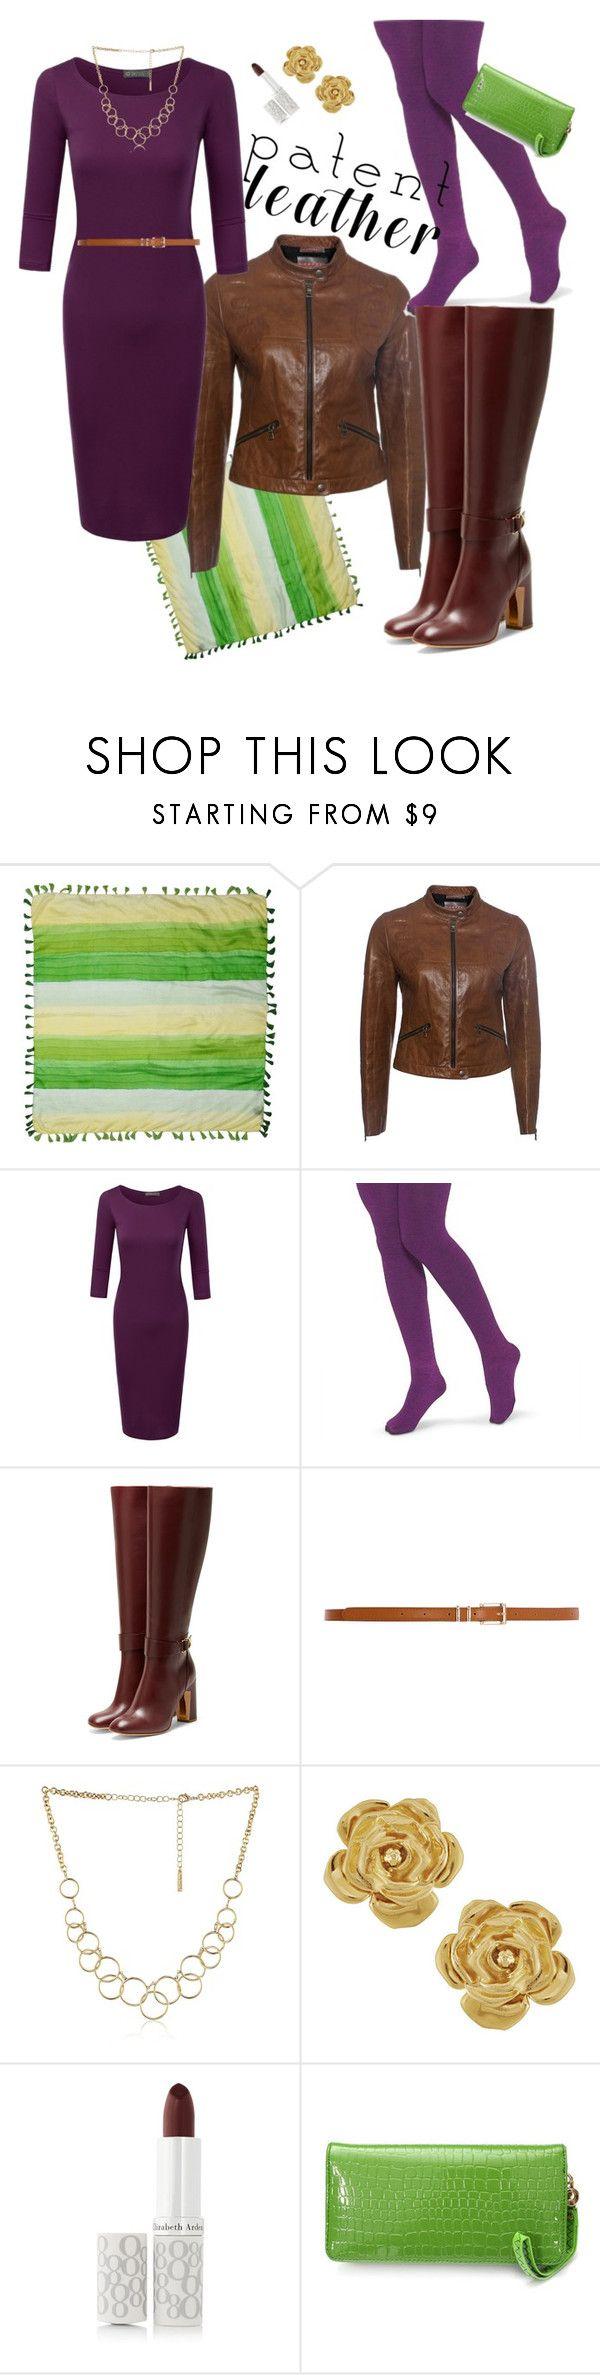 """Almost Spring"" by wardrobepieces on Polyvore featuring Roberto Cavalli, Prada, Xhilaration, Rupert Sanderson, Dorothy Perkins, Nine West, Vintage and Elizabeth Arden"